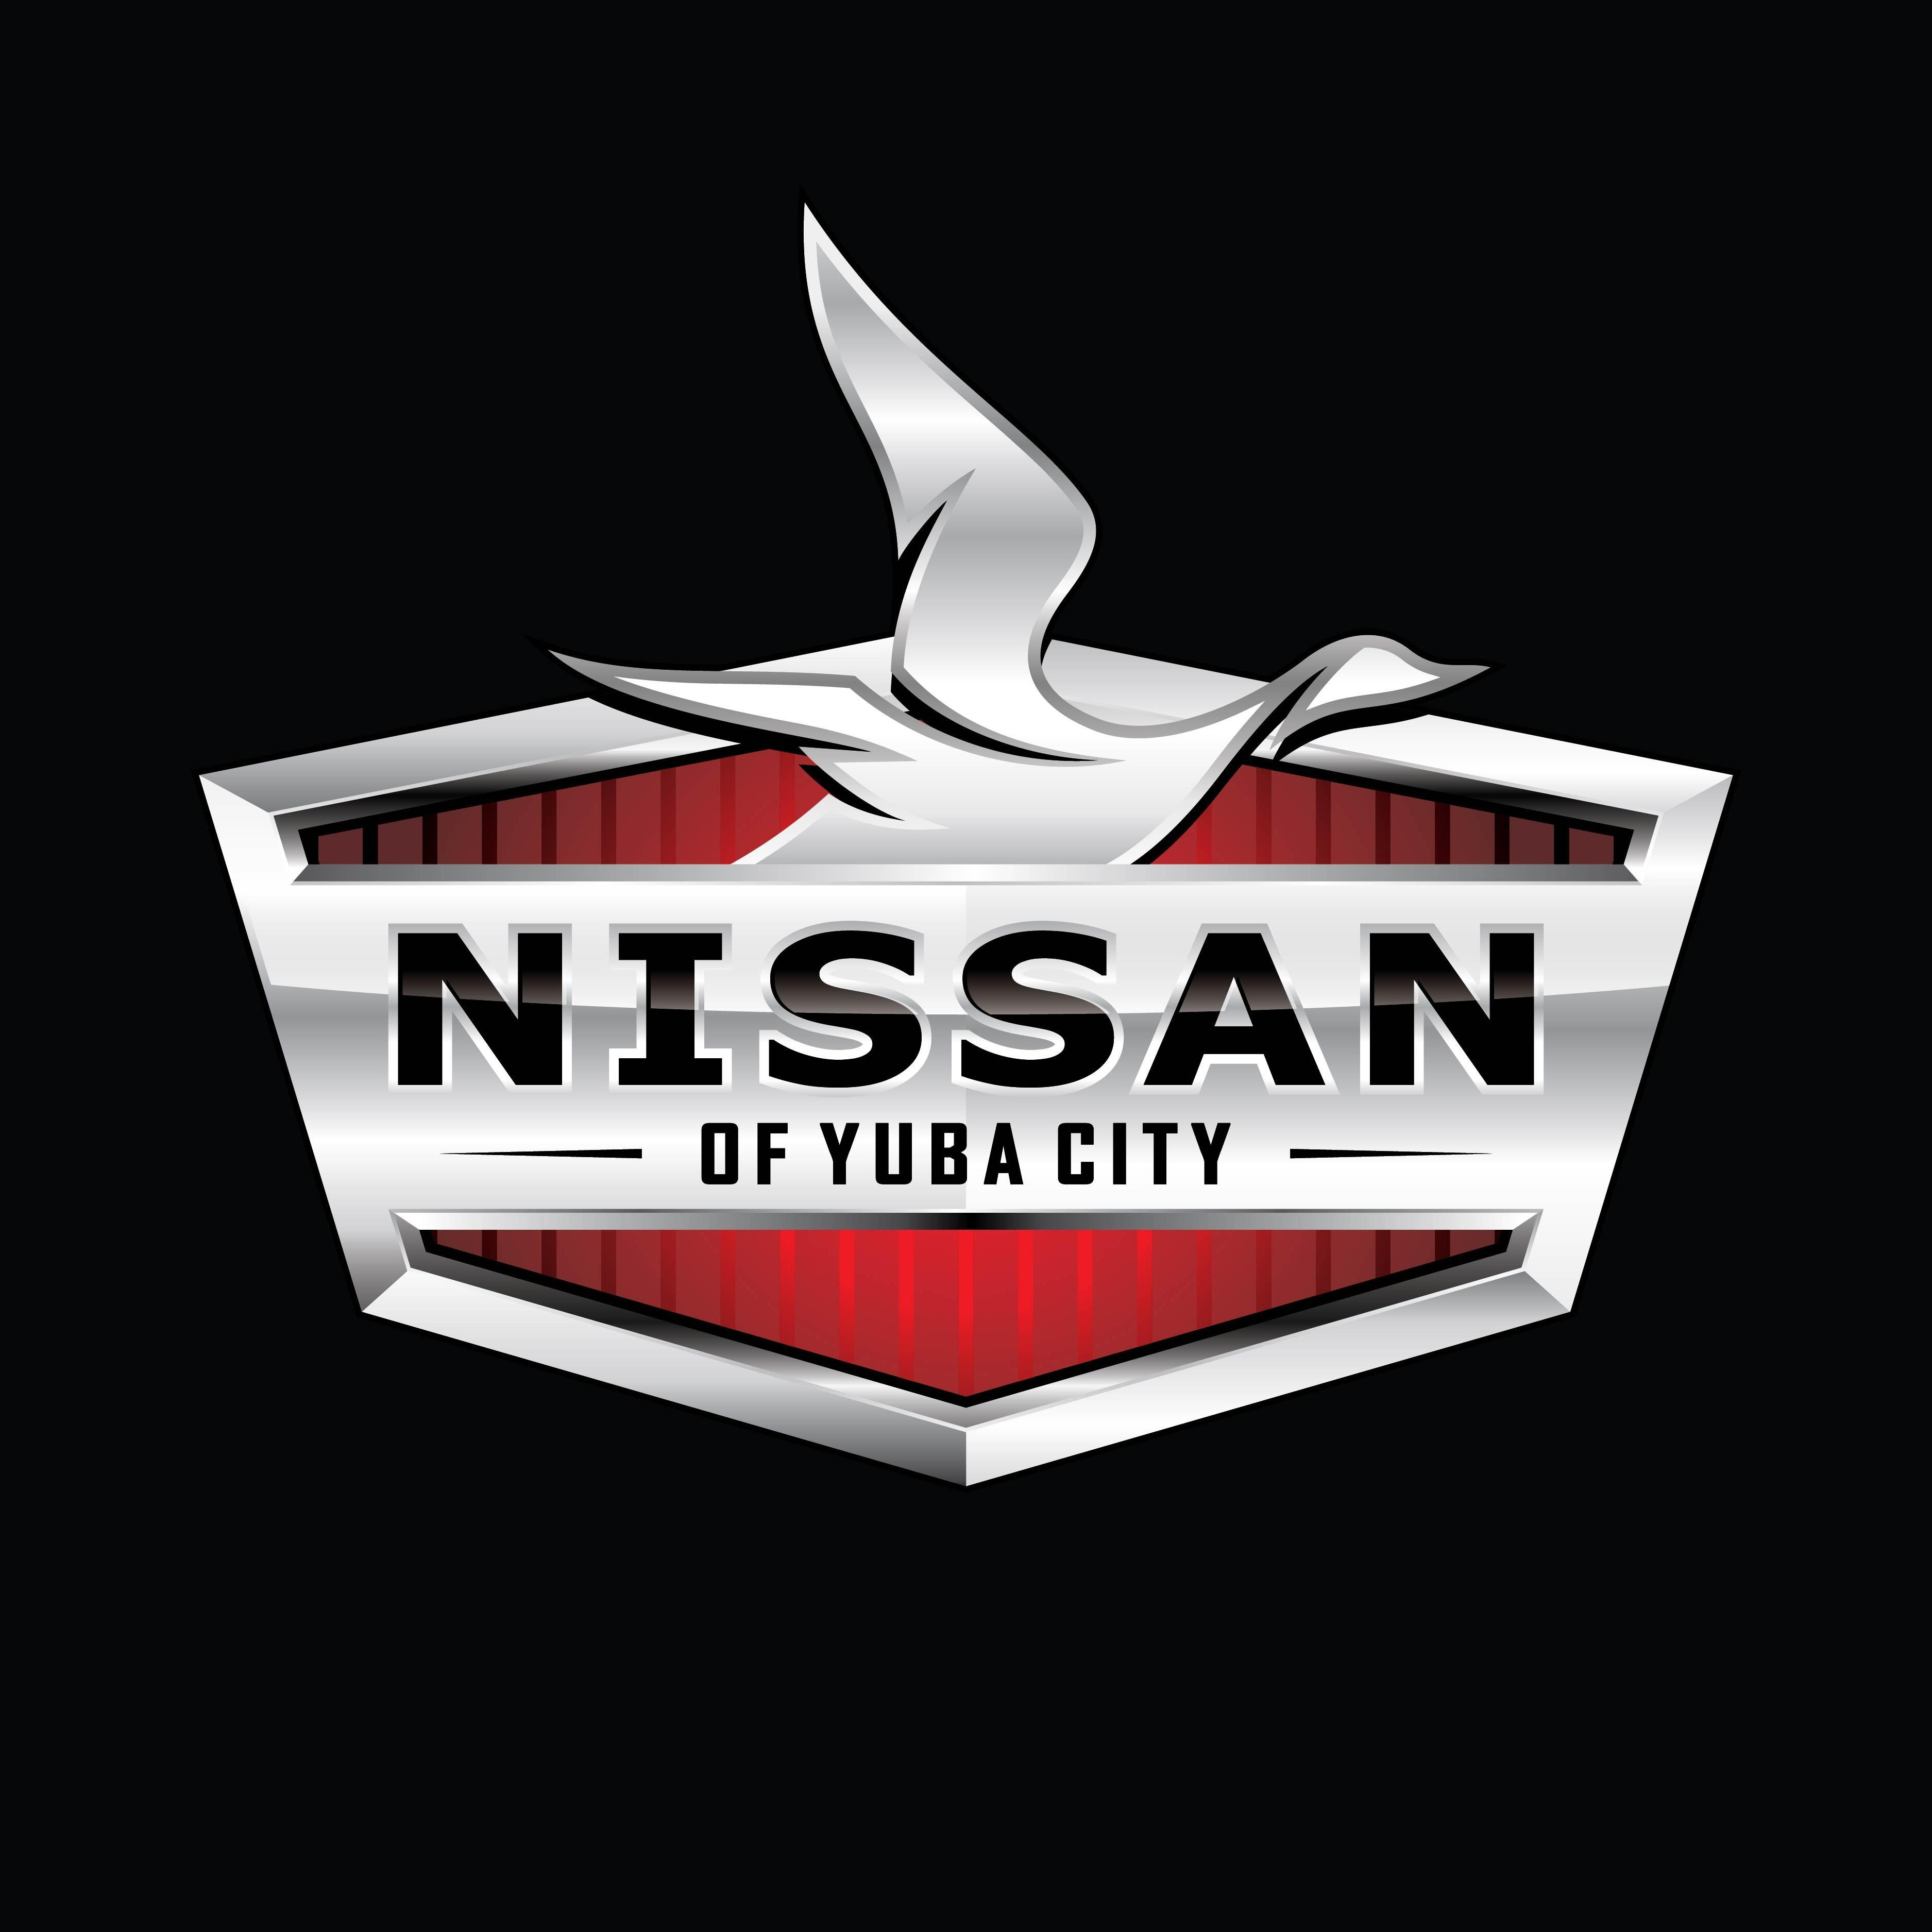 Yuba City Nissan >> Nissan Of Yuba City Yubacitynissan Twitter